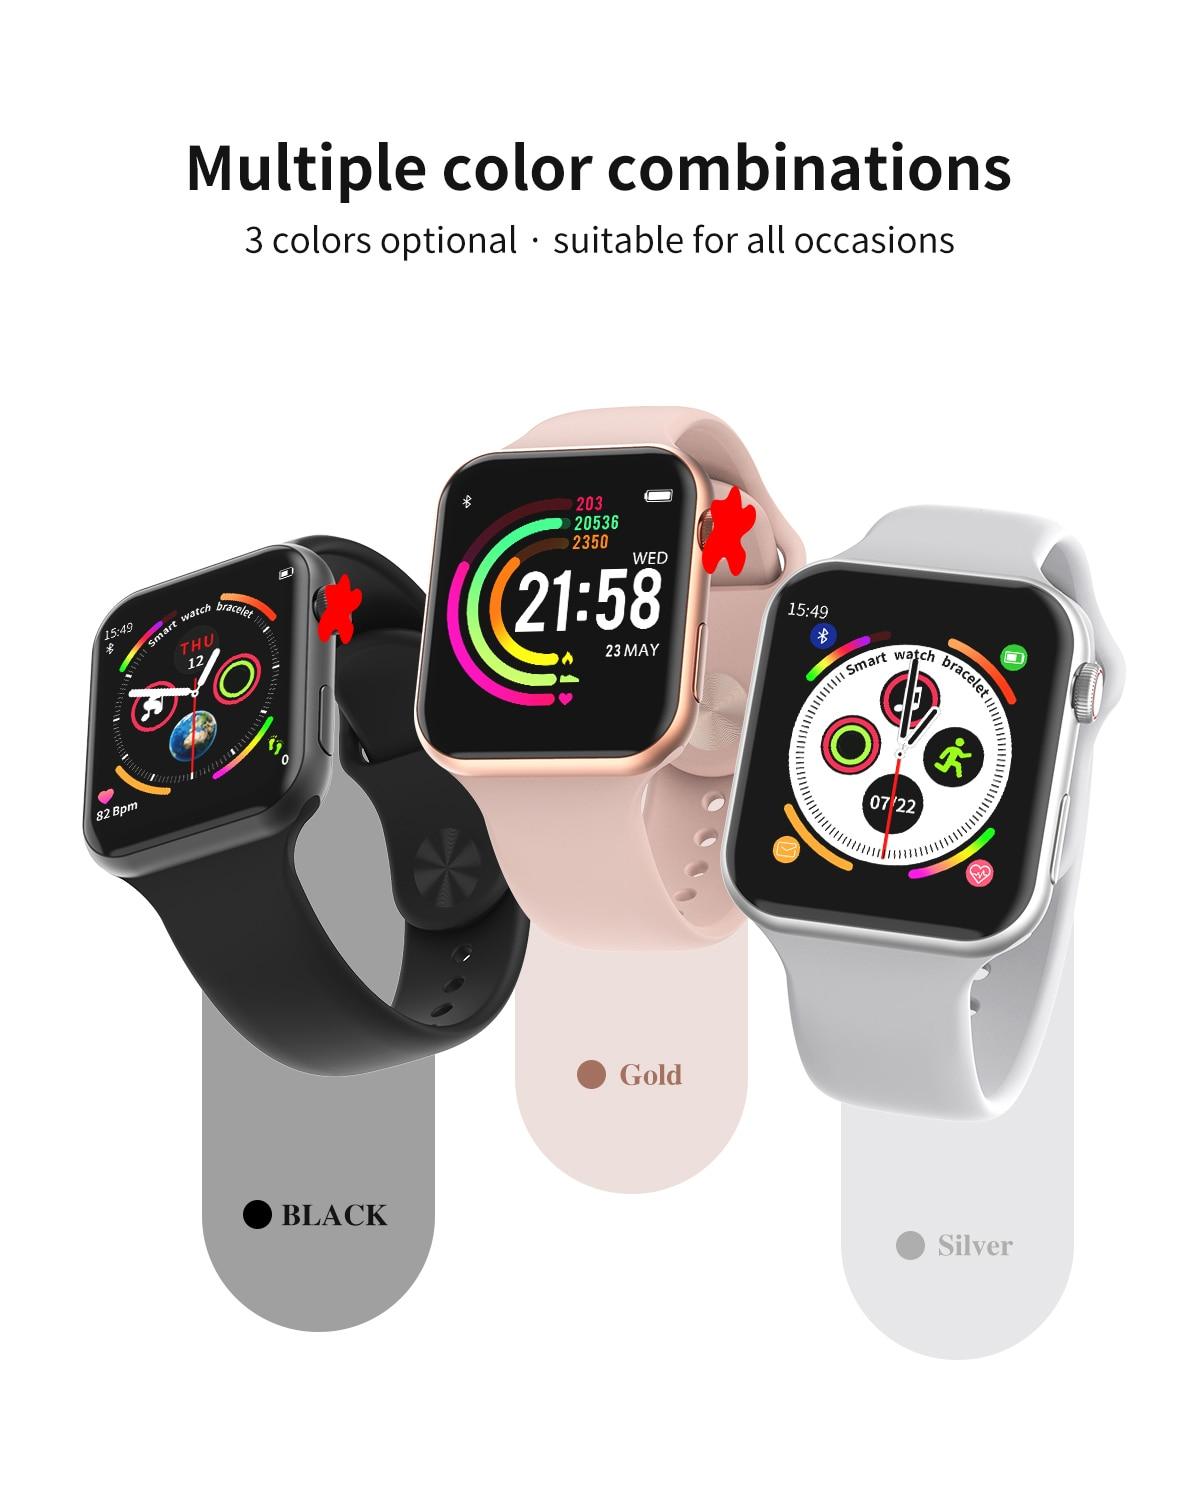 Hd1836715aef94037a7abbdaef2c6668bM 696 New Style F10 Smart Watch Full touch screen Bluetooth Smartwatch Music Camera Heart Rate Monitor Waterproof Smart Bracelet